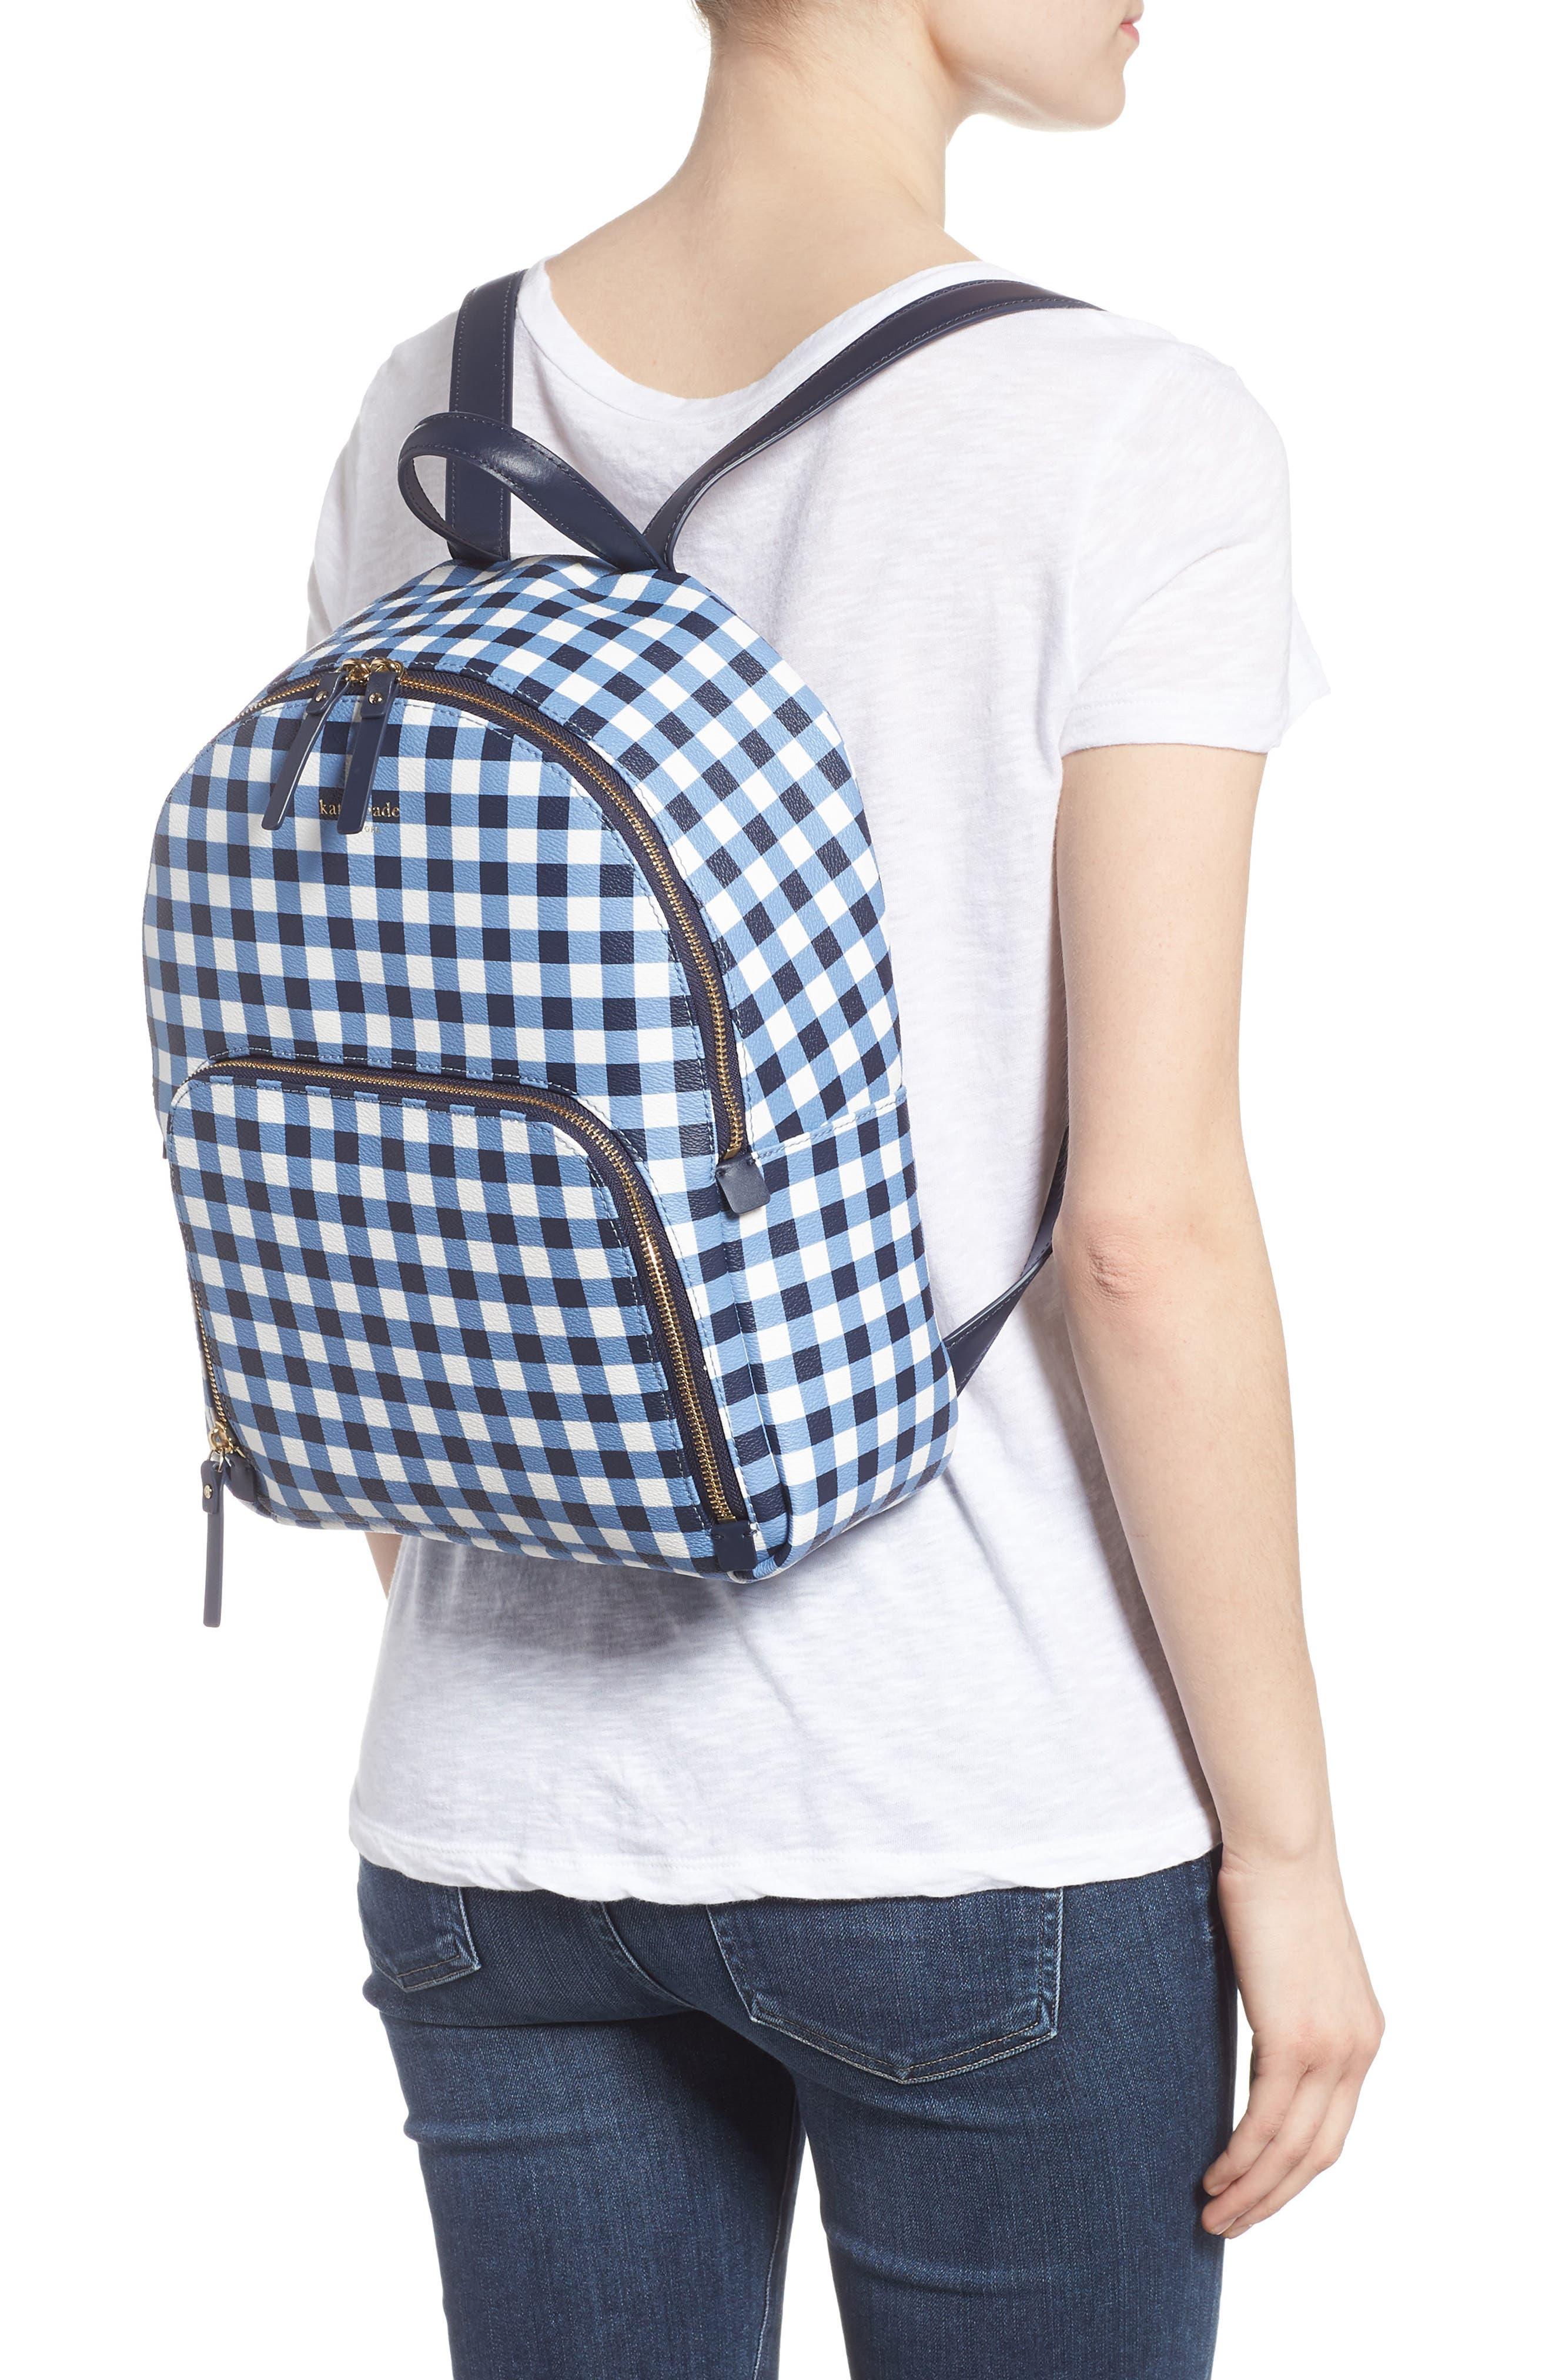 hyde lane hartley gingham backpack,                             Alternate thumbnail 2, color,                             Navy/ White